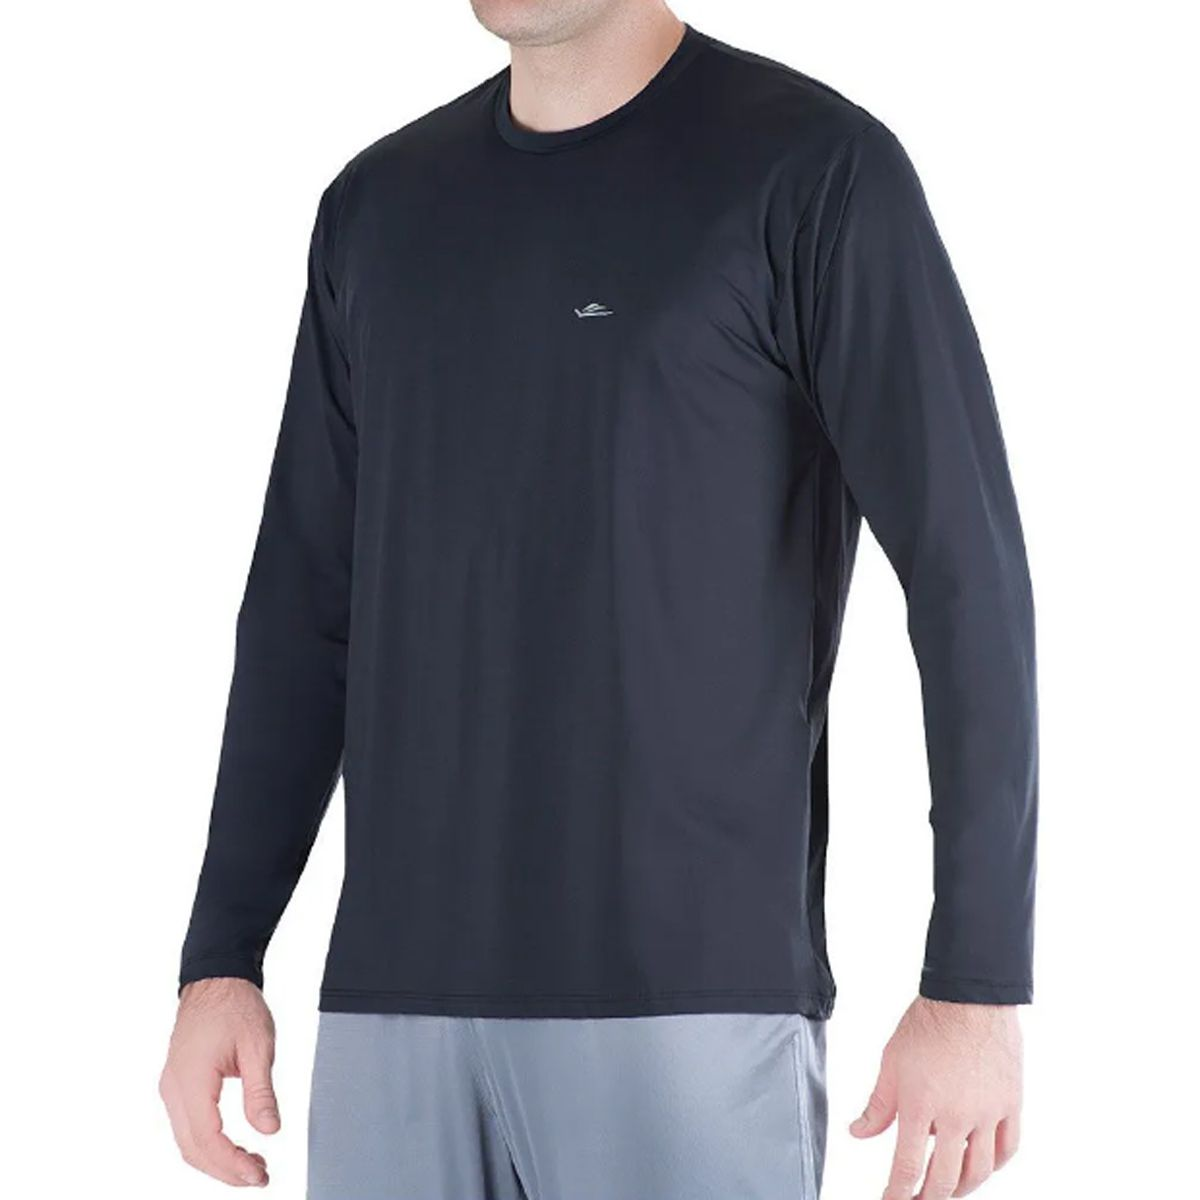 Camiseta Térmica Elite Preta UPF 50+ Tamanho Especial